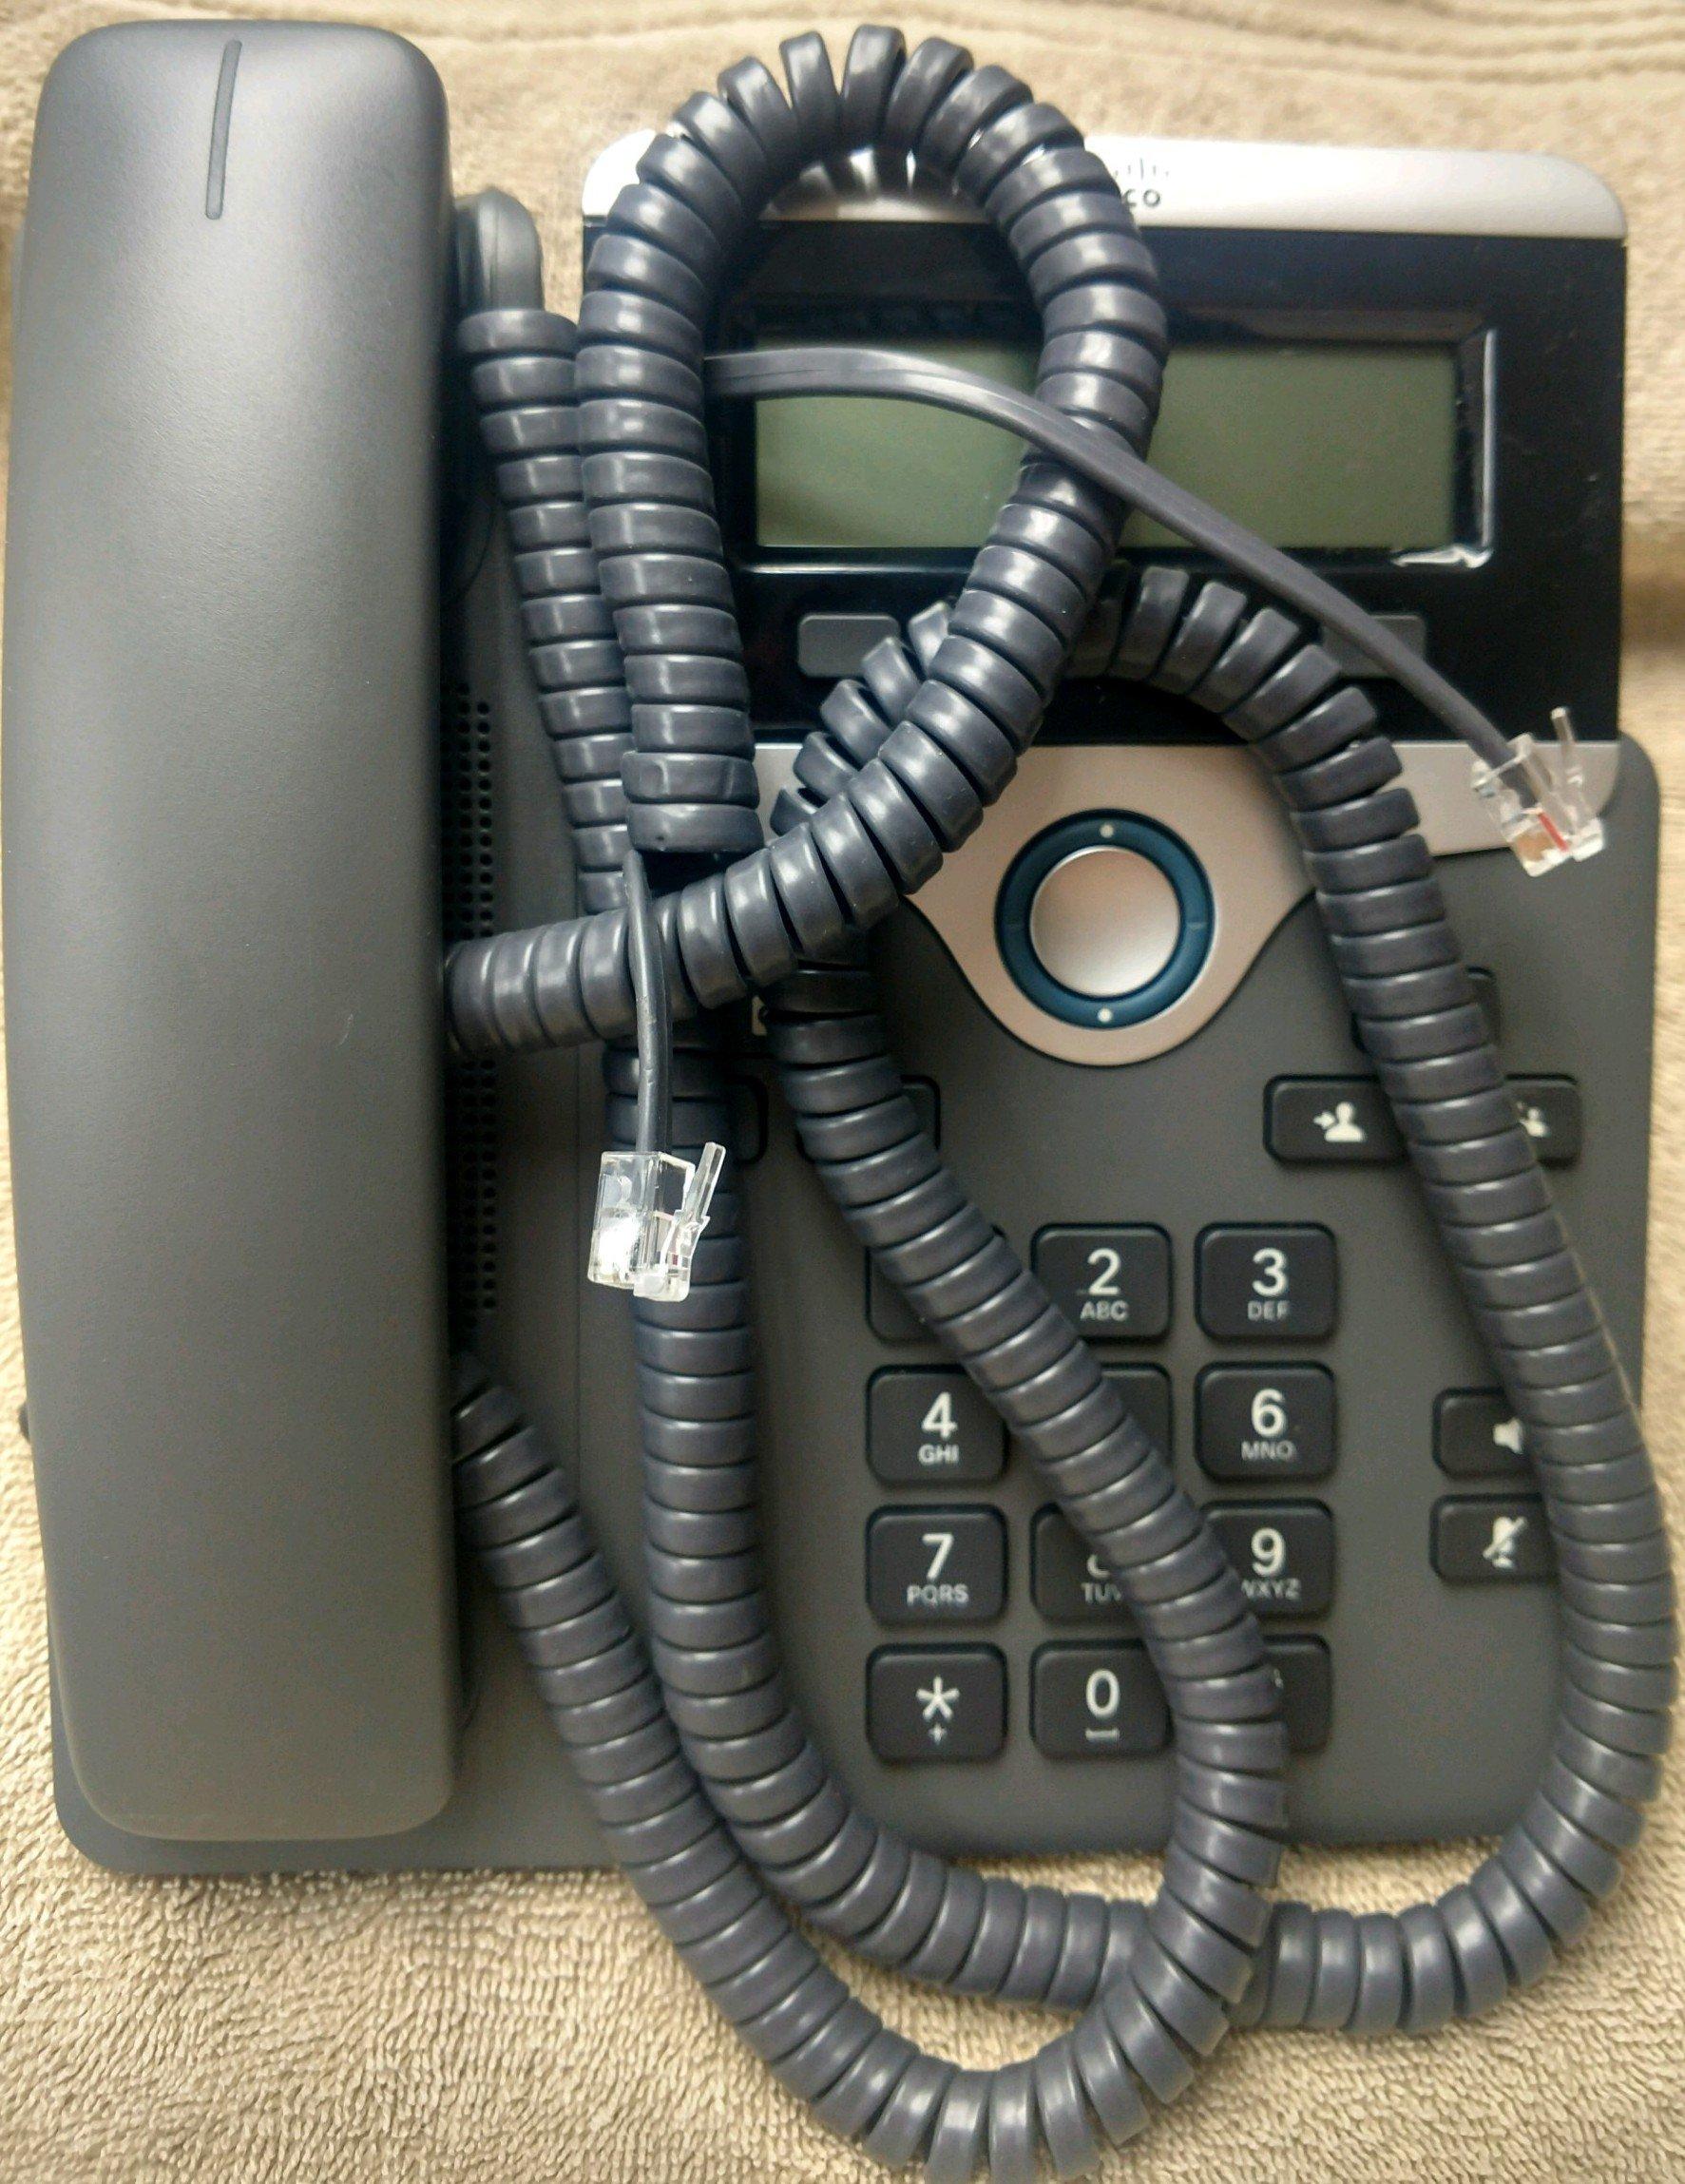 7 Ft Handset Cord Gray Cisco 7900 Series Phone 7945 7975 7971 7970 7965 7962